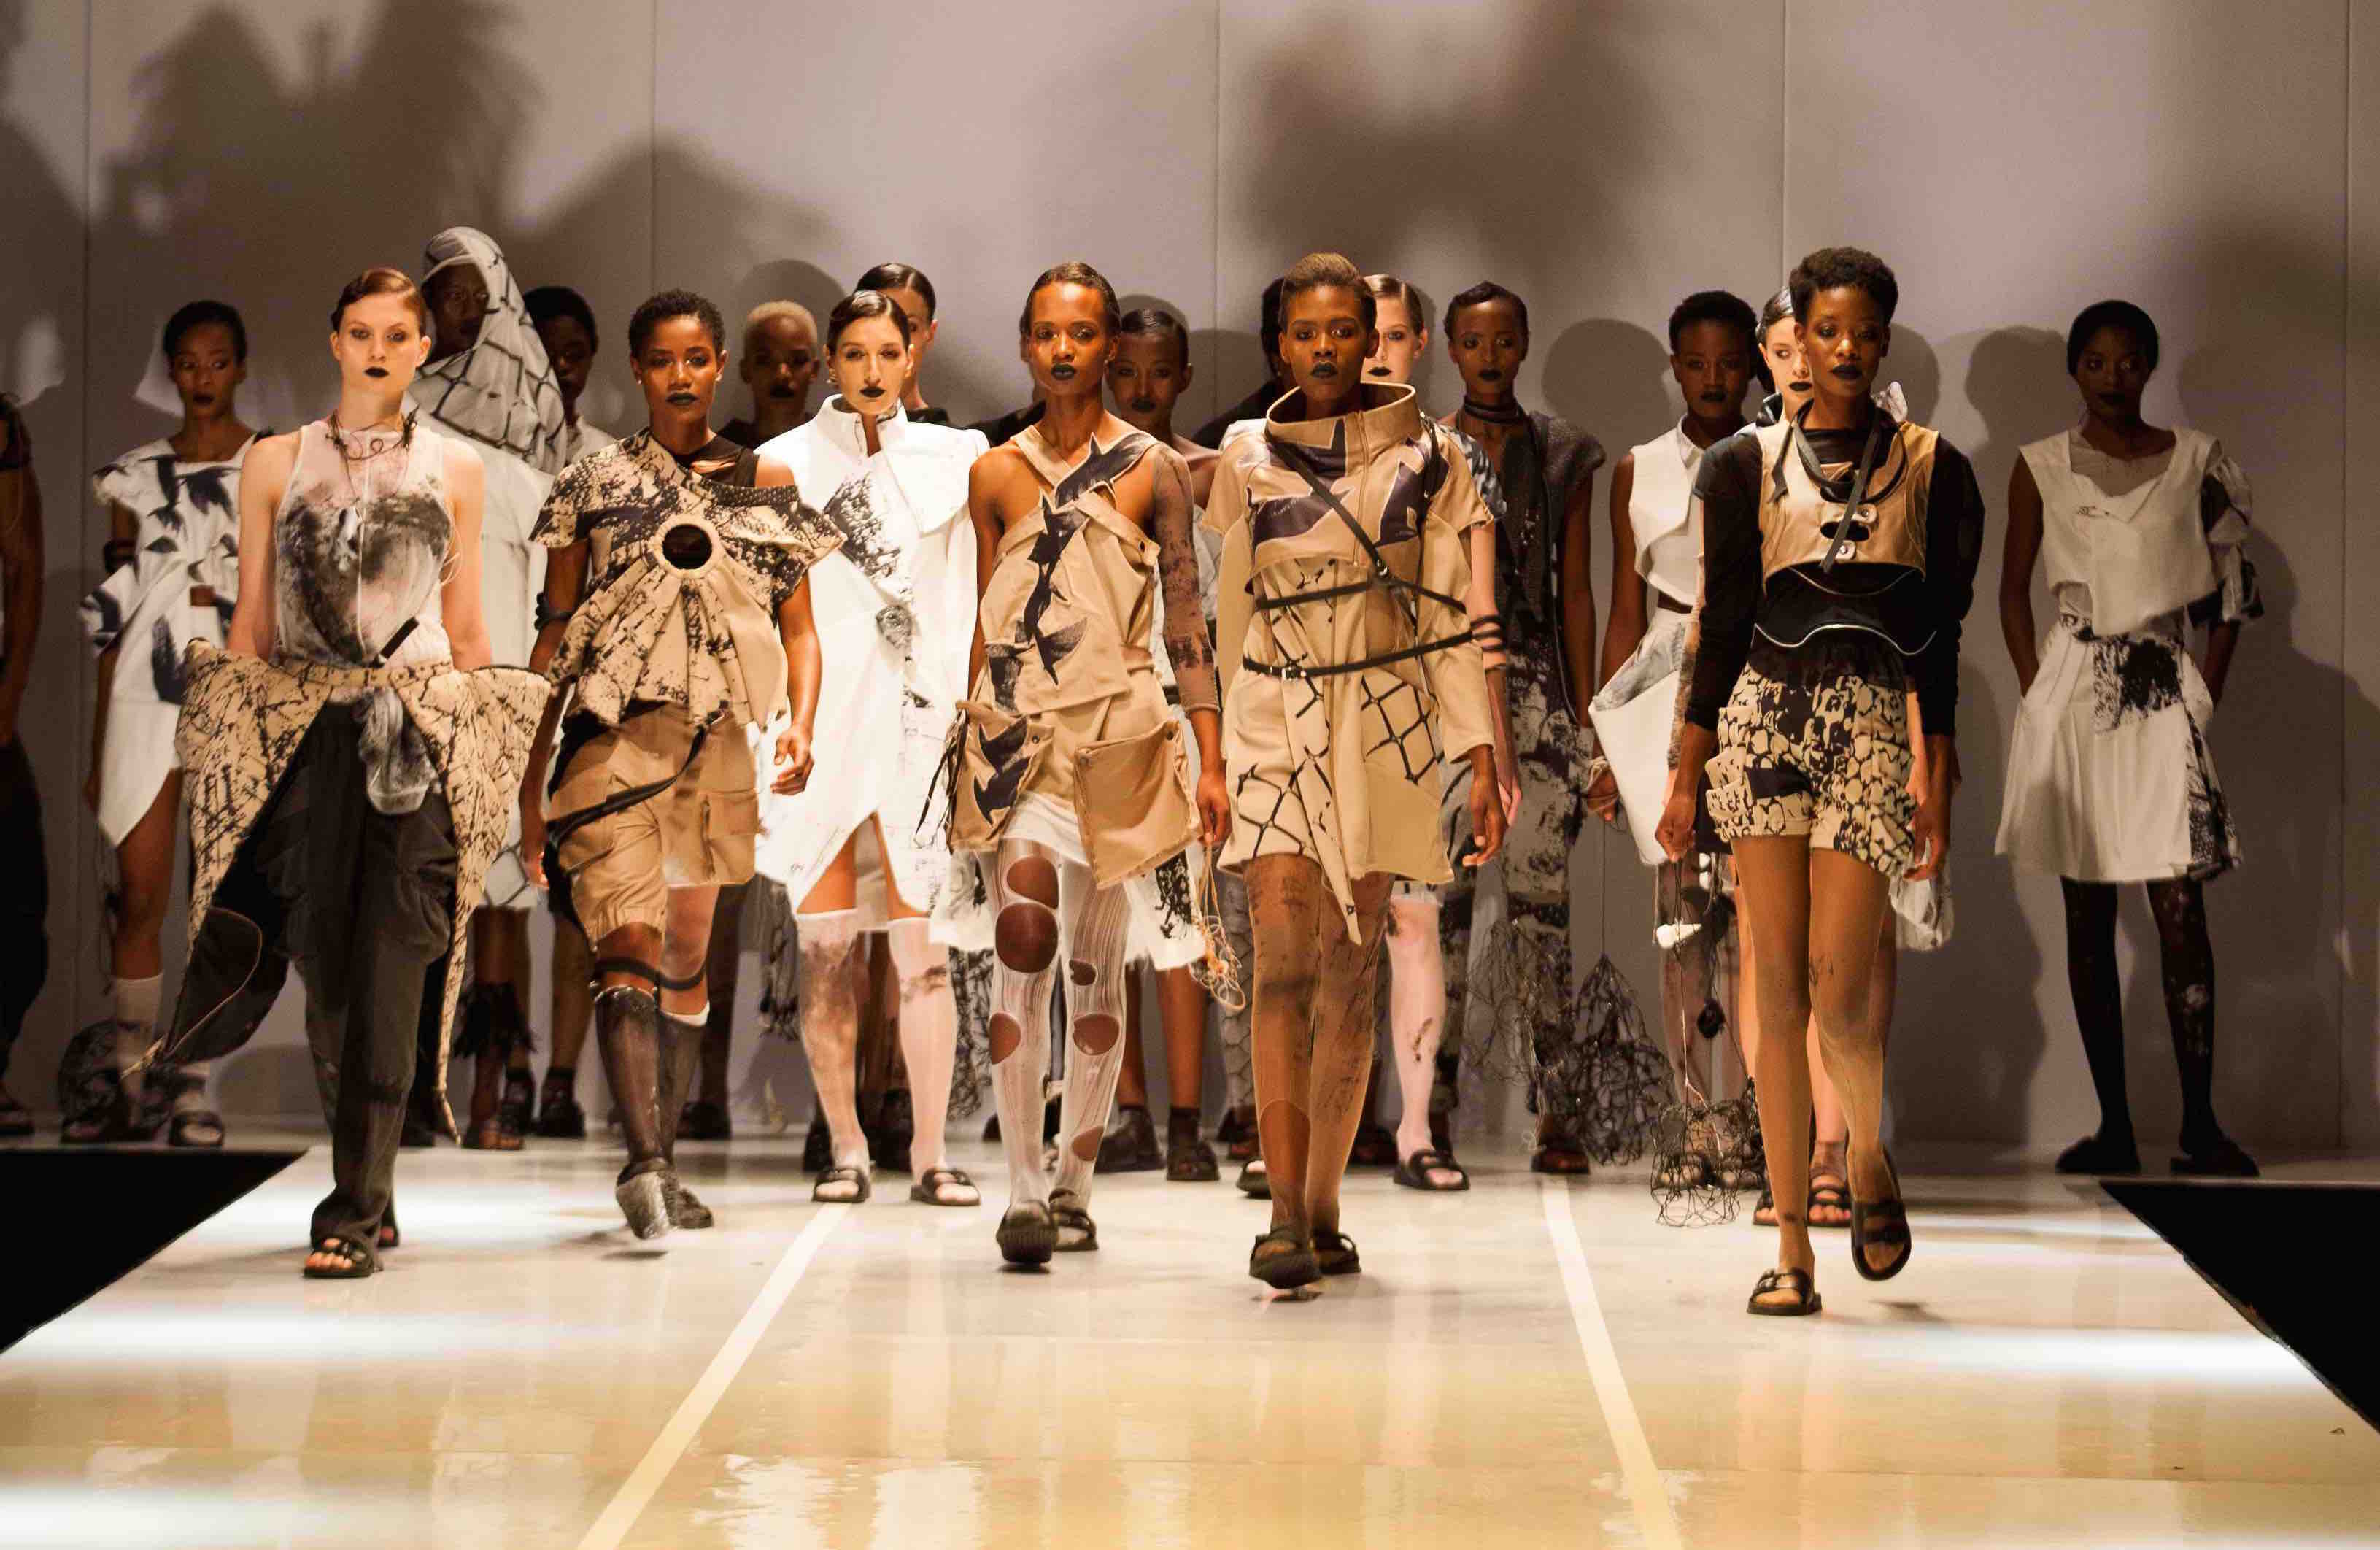 How Much Money Does A Dress Designer Make